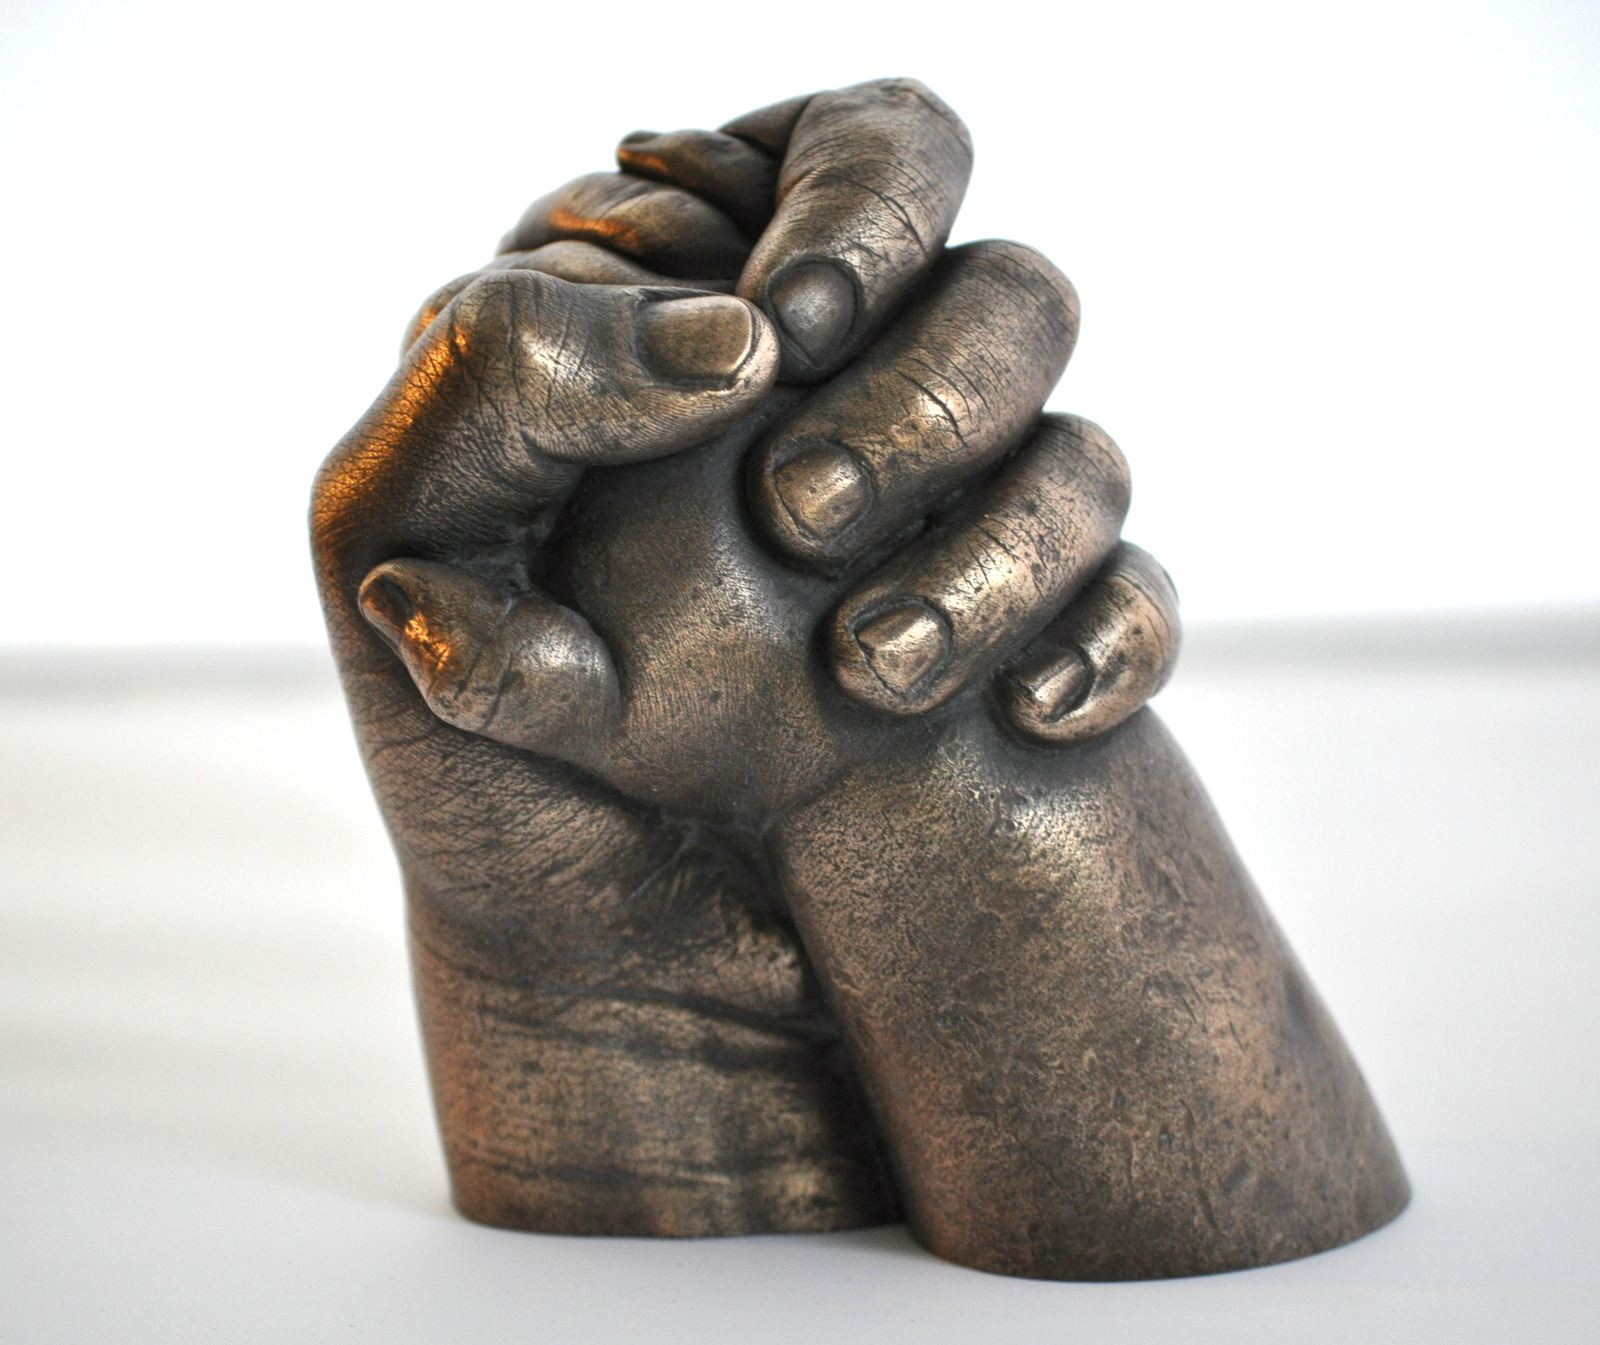 Sibling holding hands in bronze resin